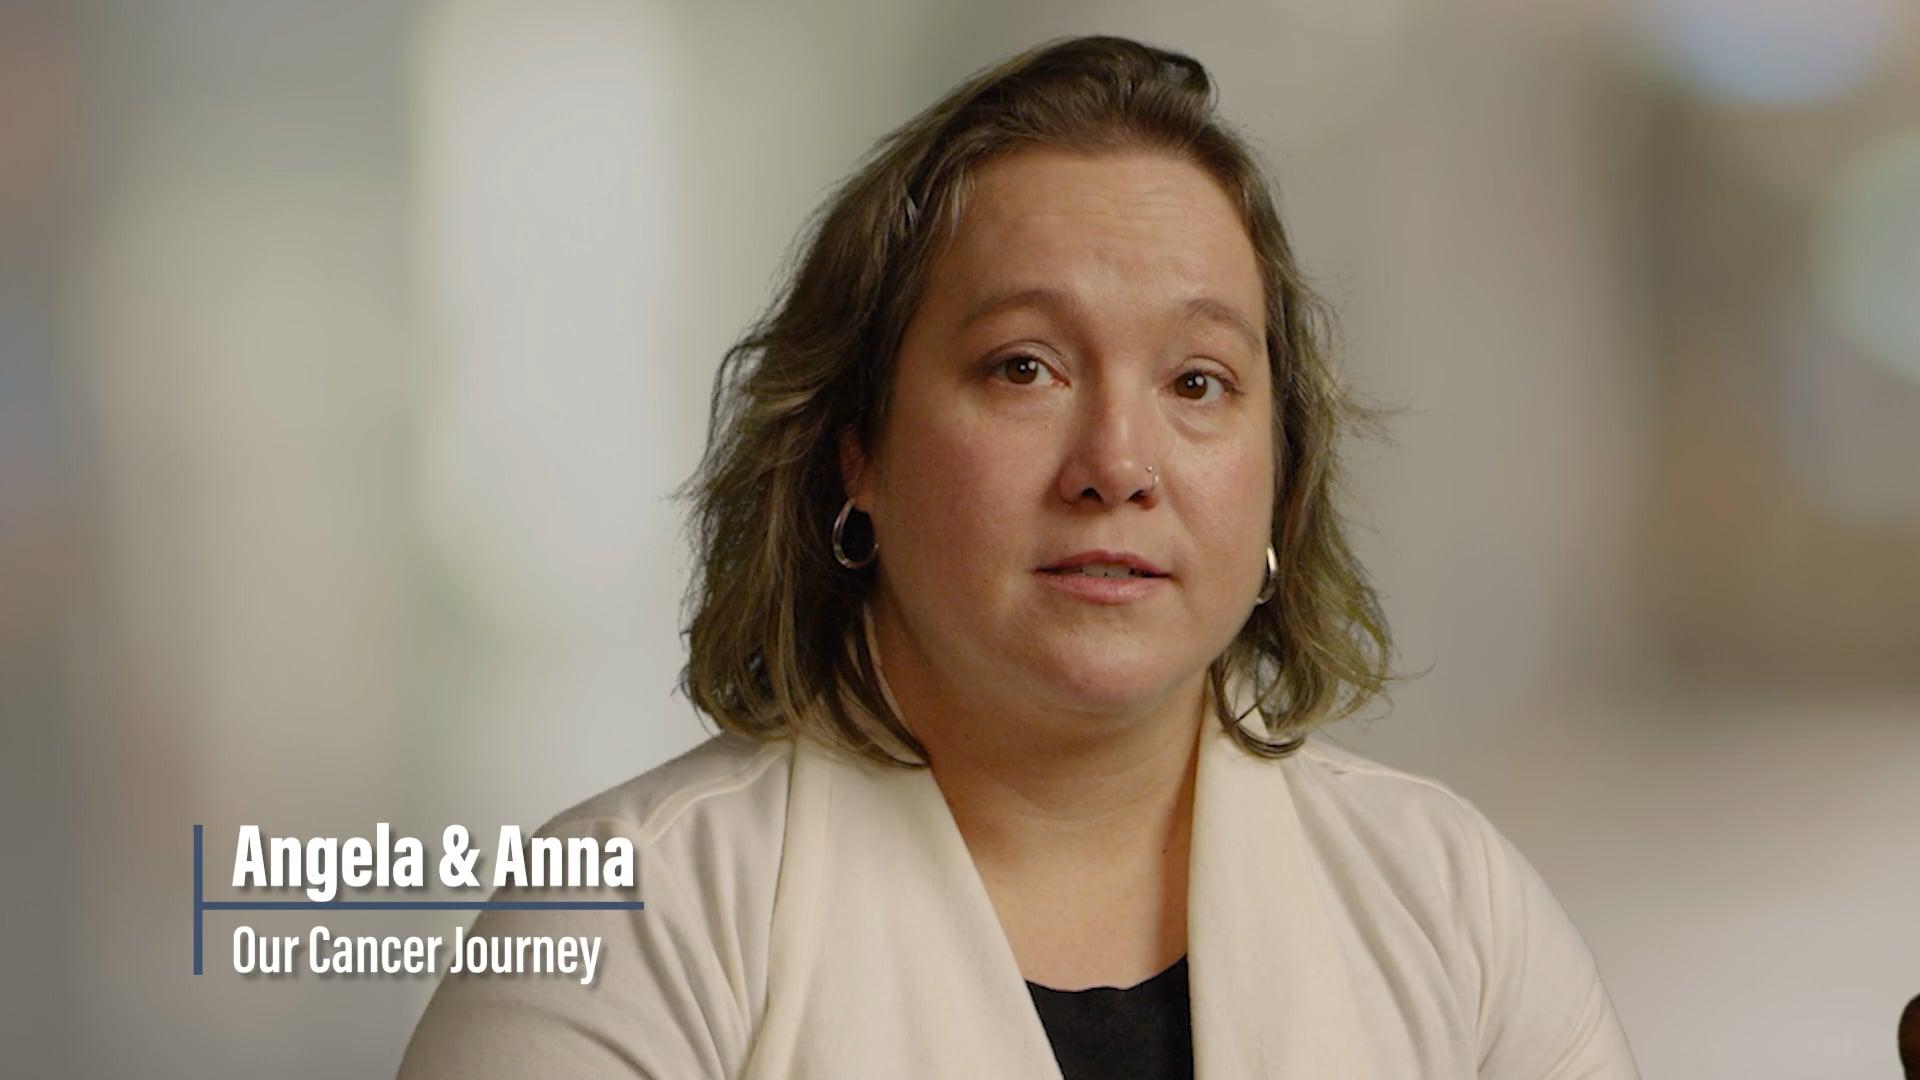 Angela and Anna Testimonial